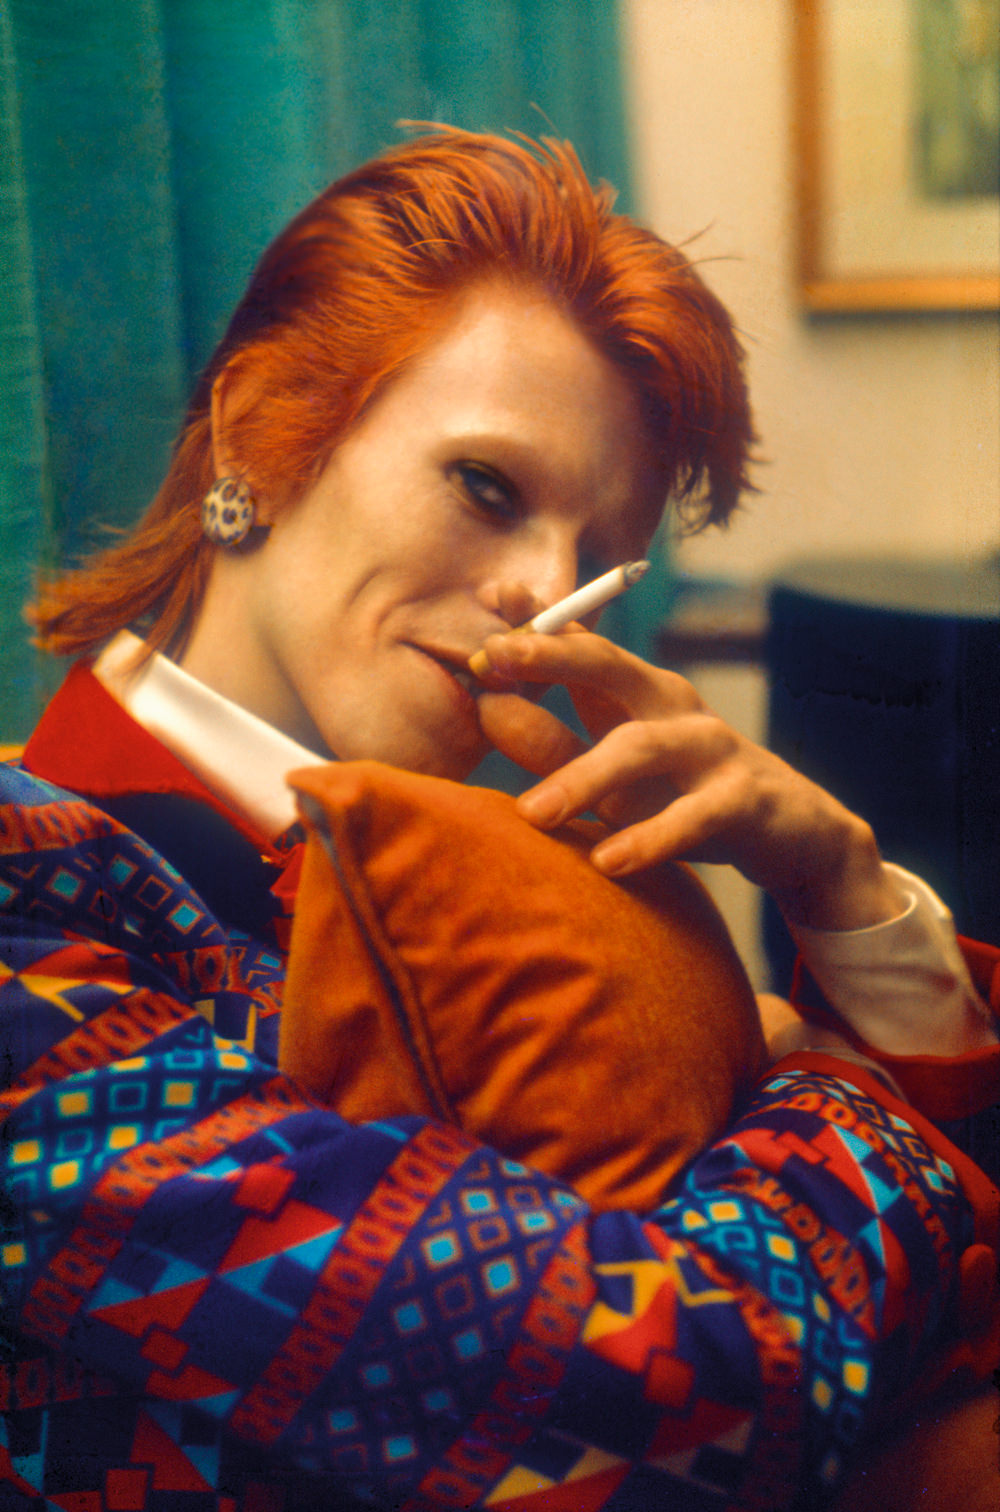 Legendary shots of David Bowie by Mick Rock